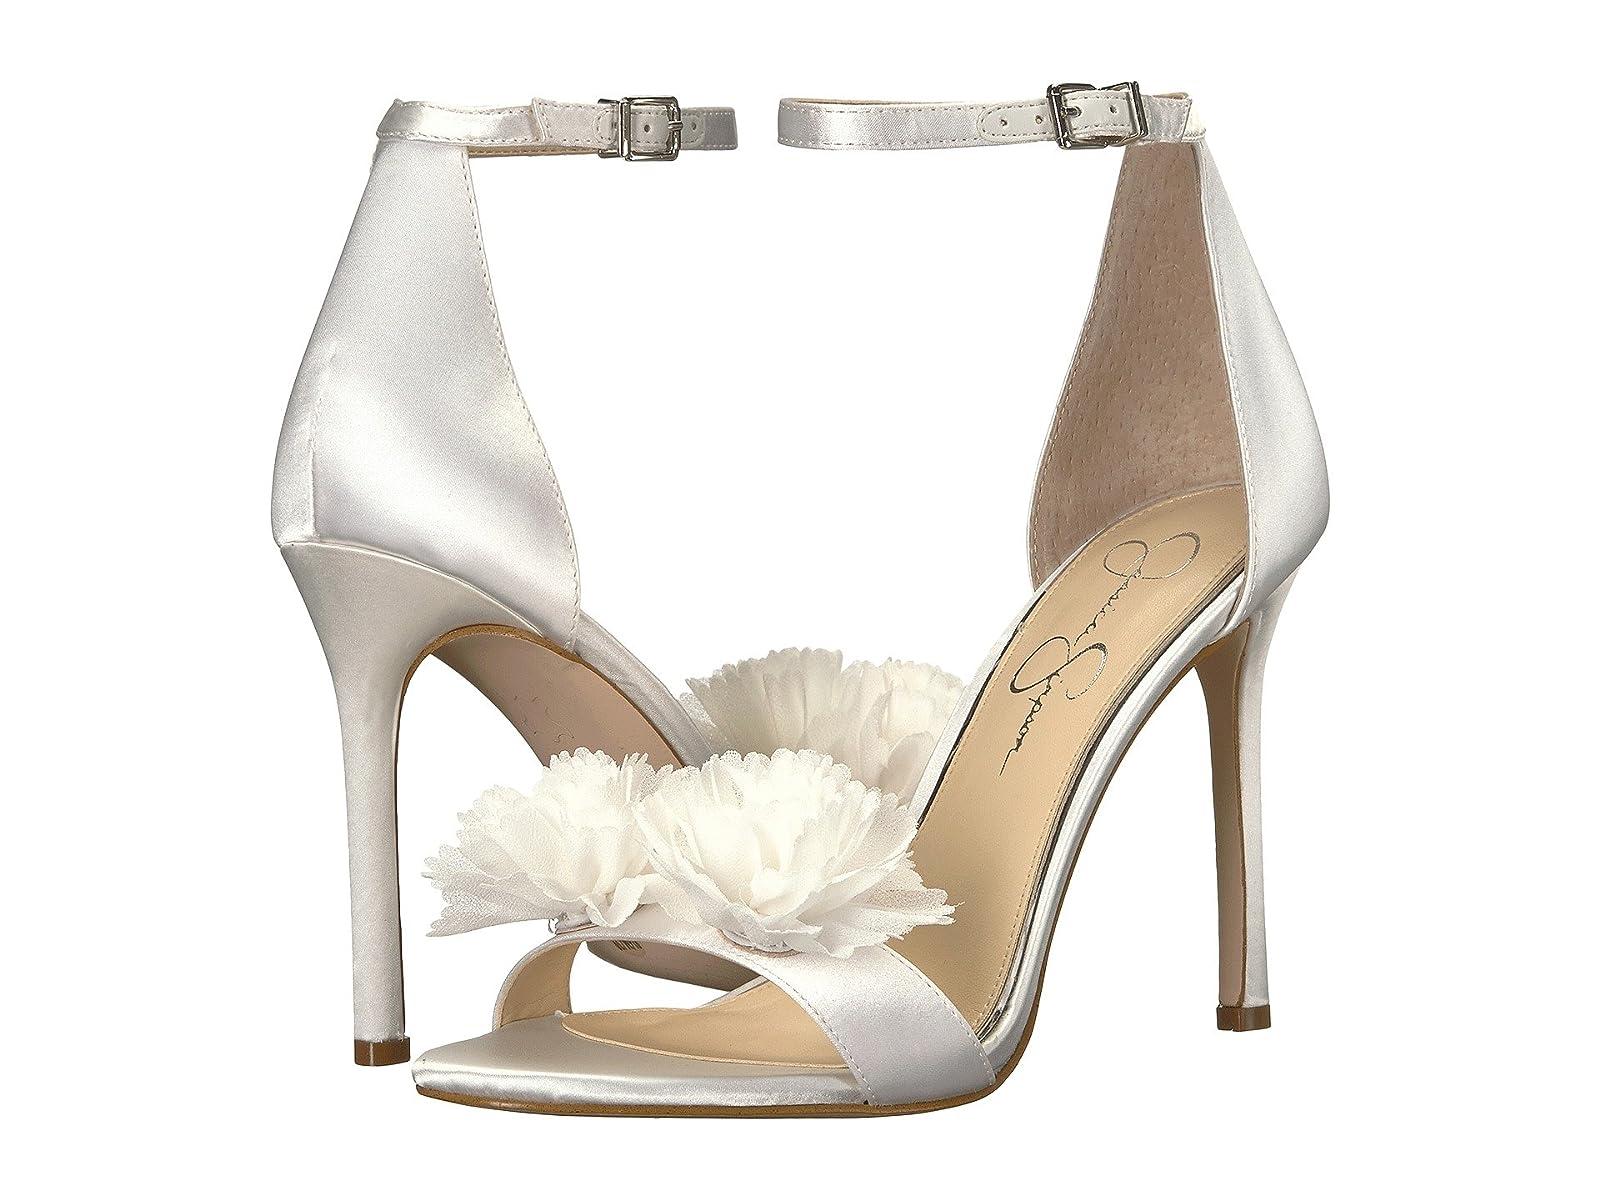 Jessica Simpson JeenaCheap and distinctive eye-catching shoes